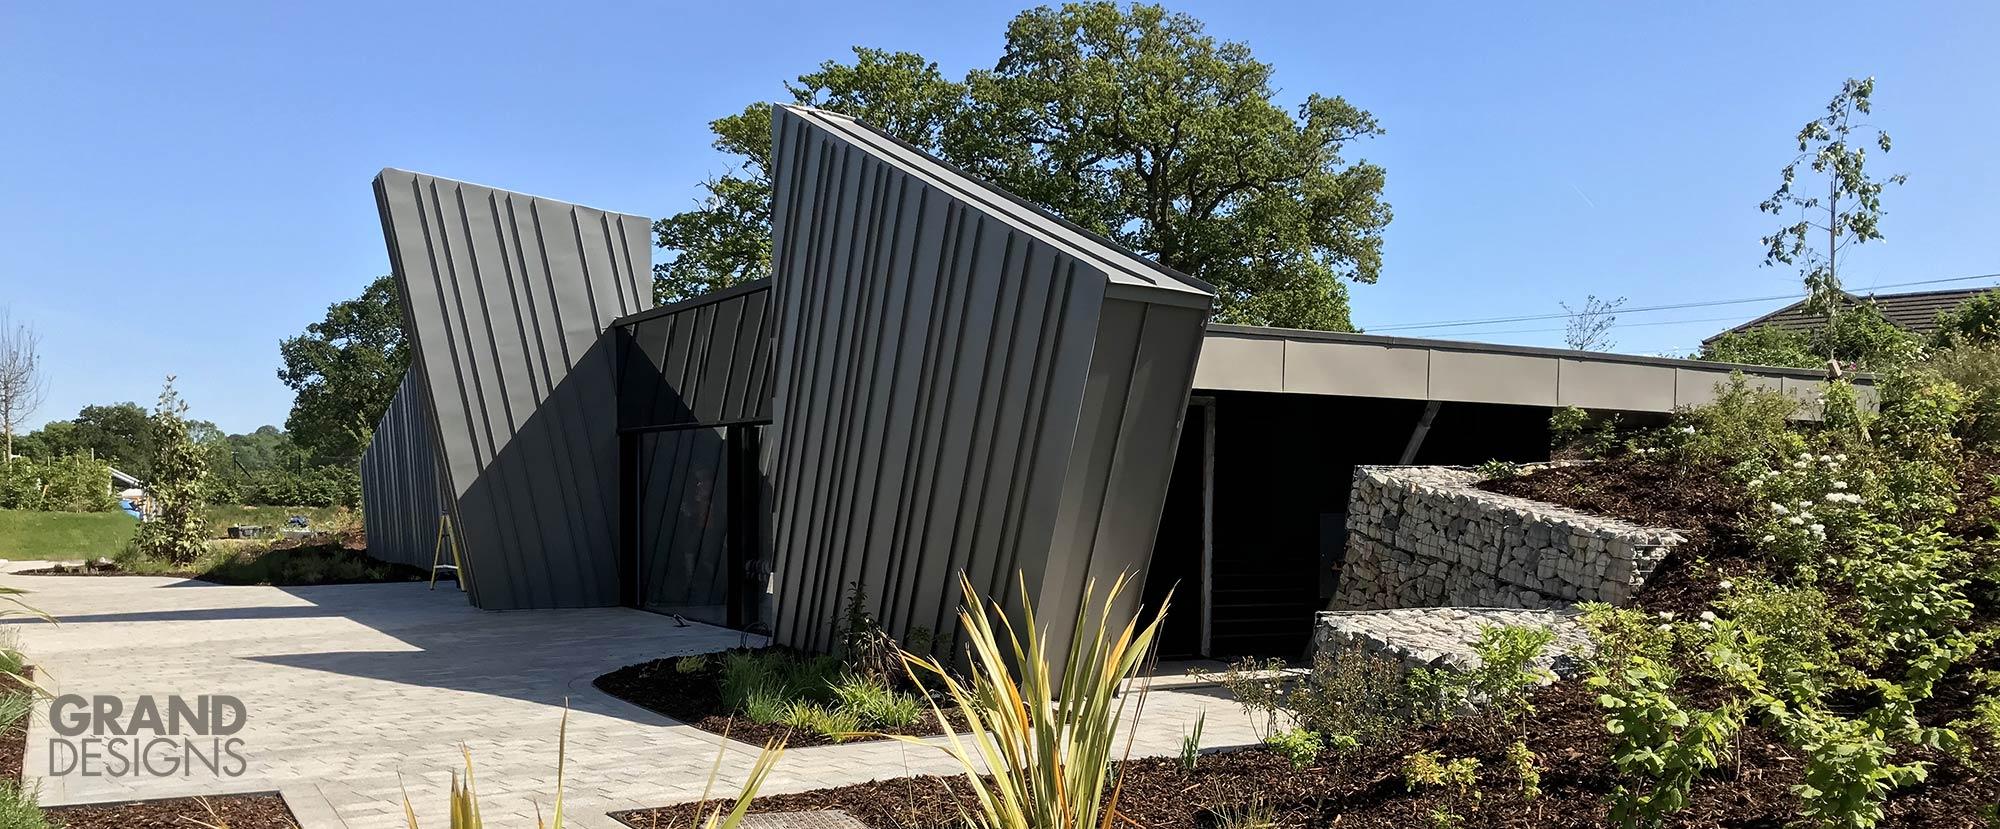 Grand Designs Architects